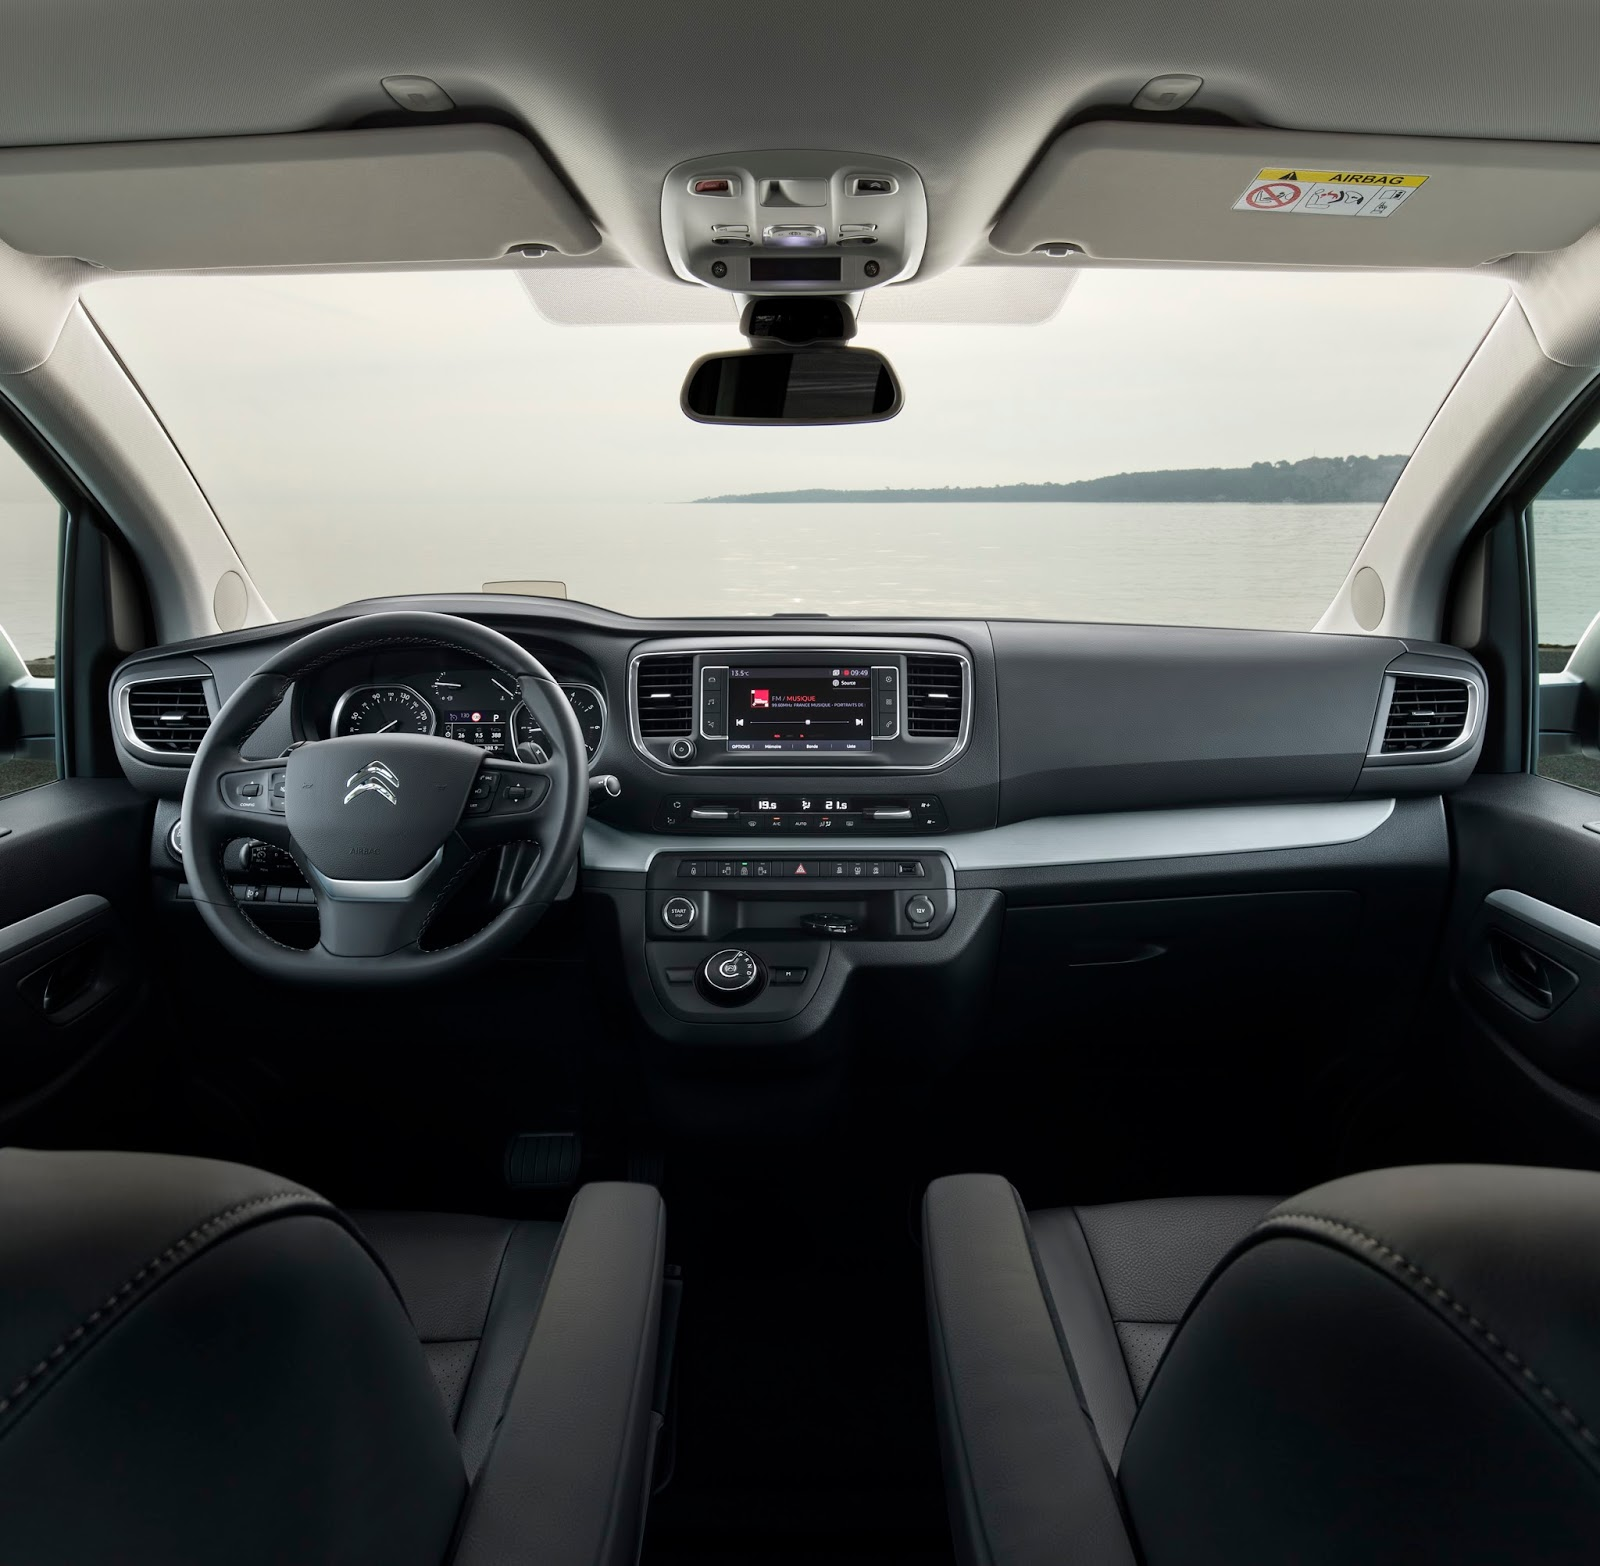 Copie%2Bde%2BCL%2B16.010.035 Με 5 Παγκόσμιες Πρεμιέρες η Citroën Στο Σαλόνι Αυτοκινήτου της Γενεύης